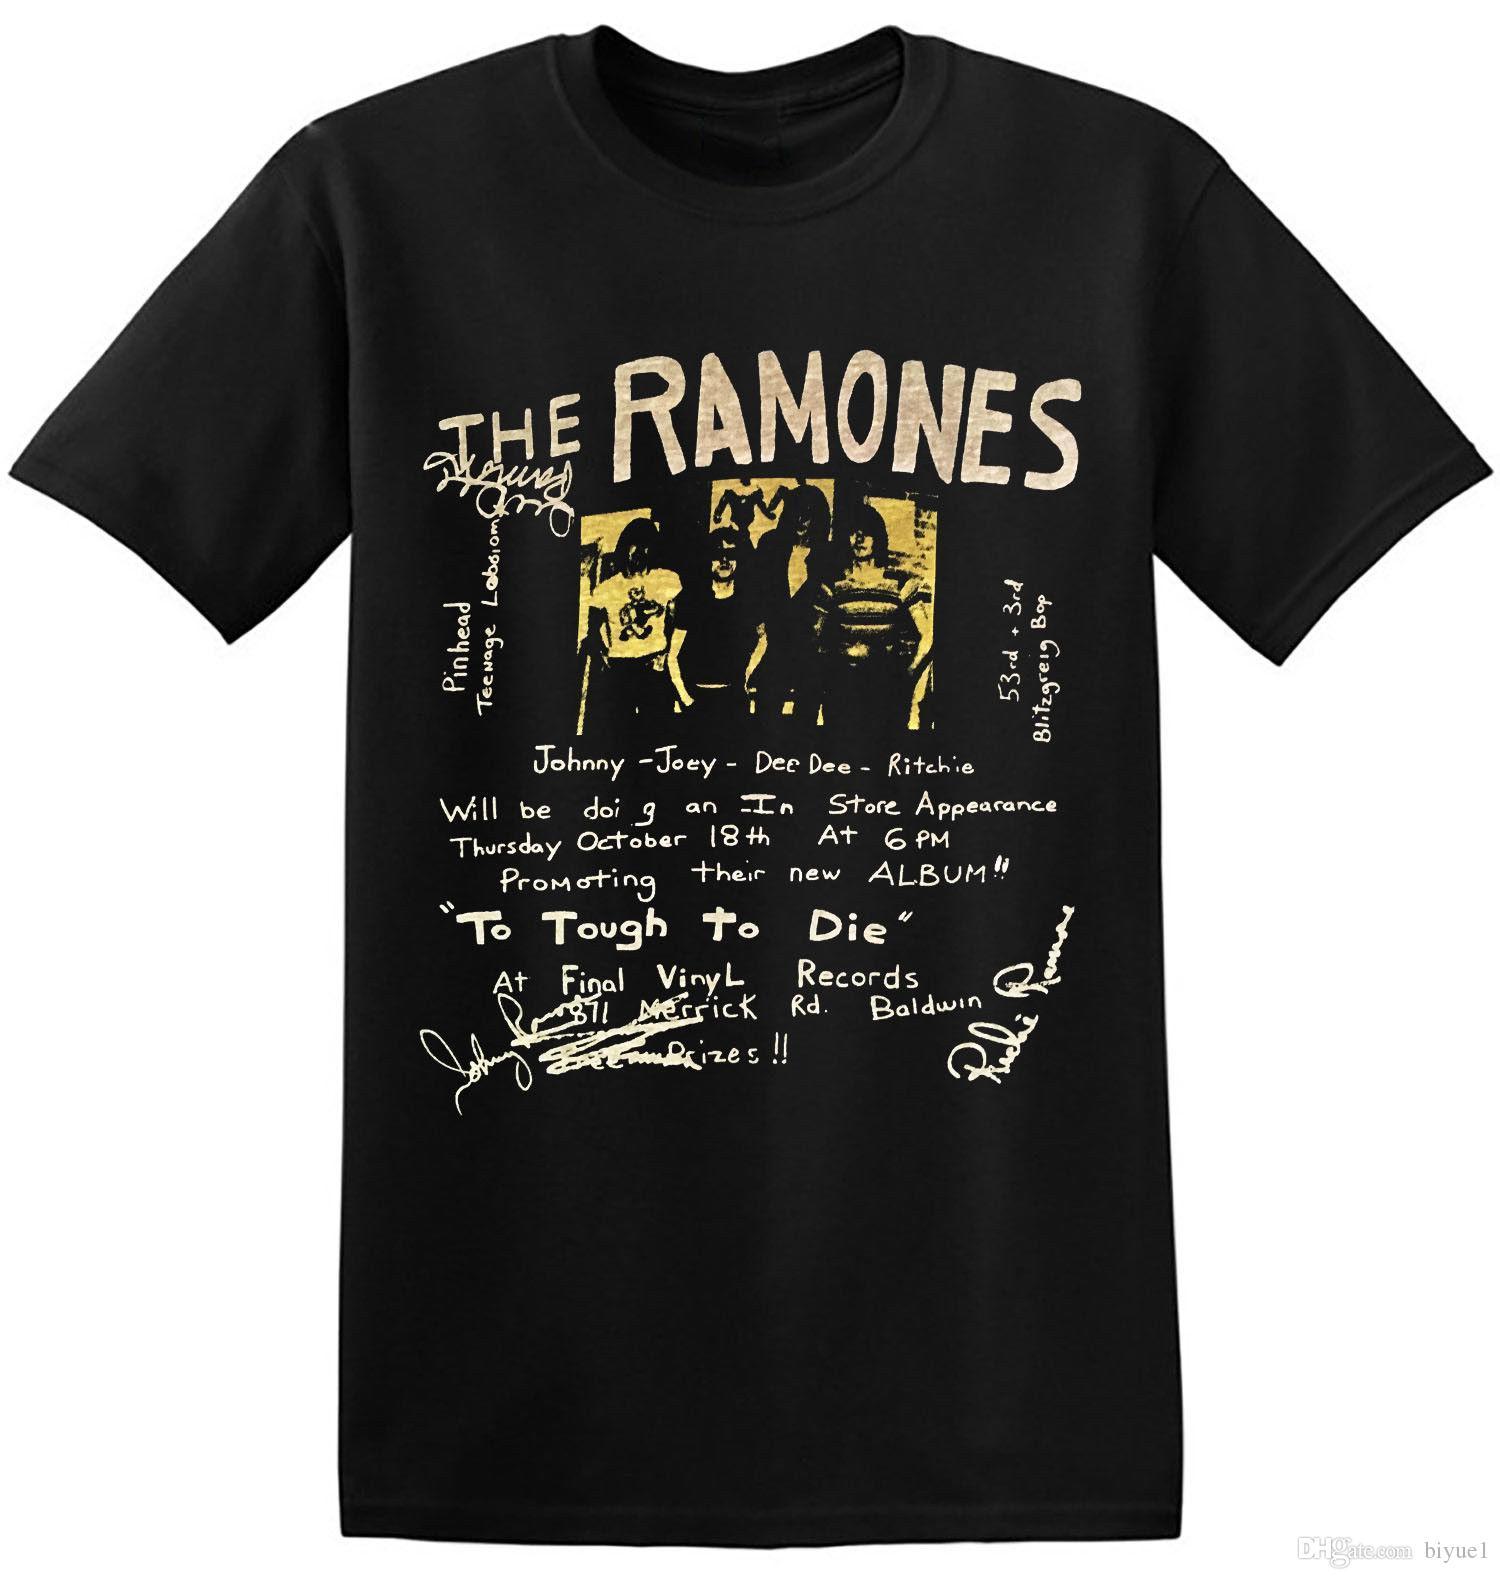 Ramones T Shirt Vintage Classic Rock Band New Graphic Print Tee Shirts  1-A-005